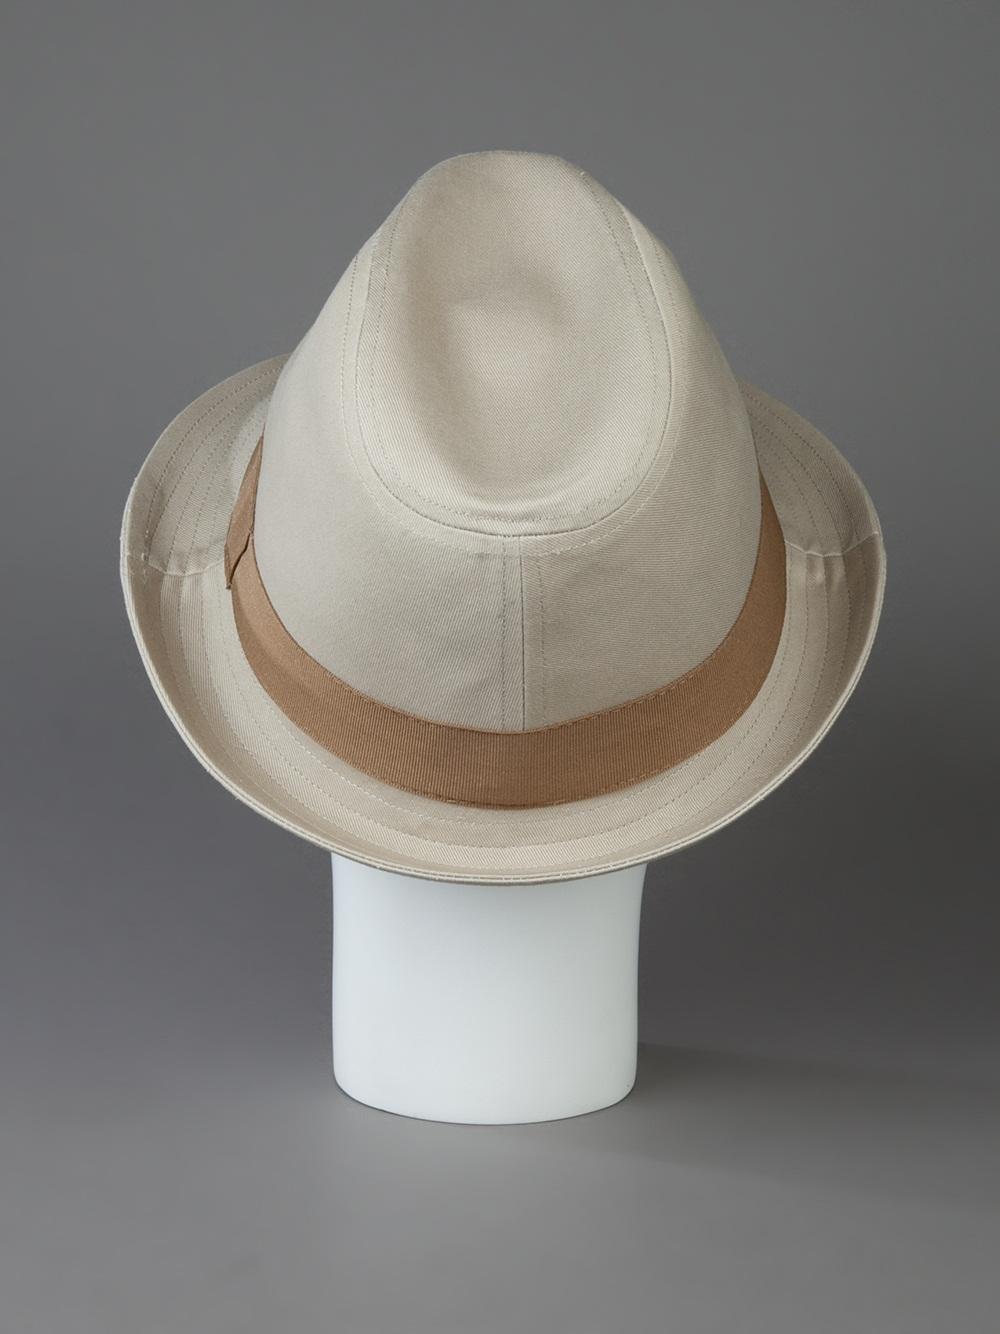 Ralph lauren Panama Hat in Natural for Men   Lyst